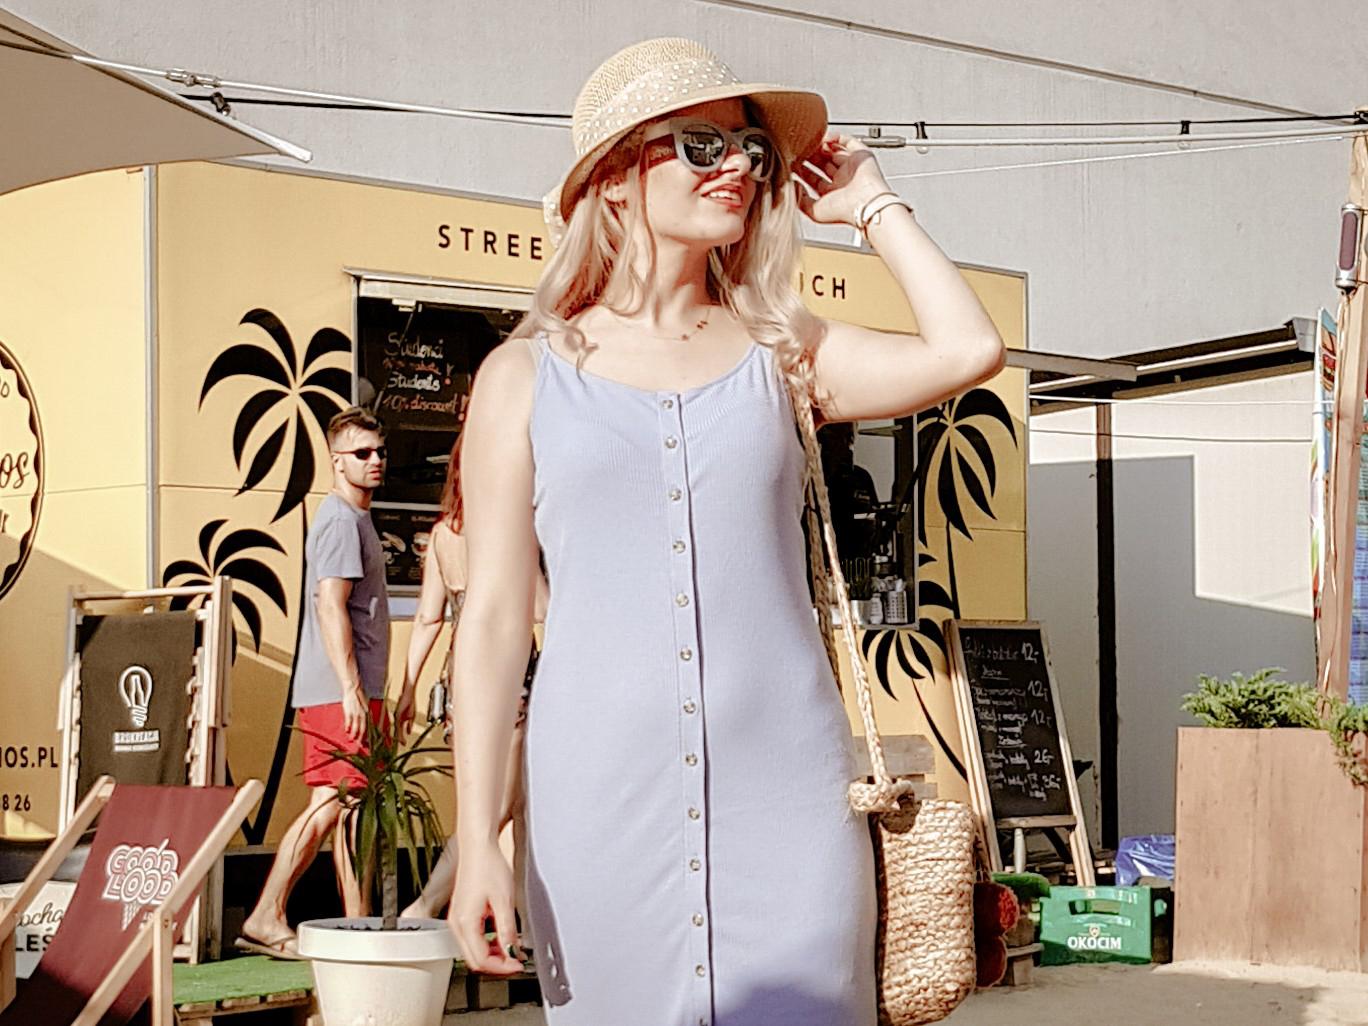 SUkienka forever 21 buty CCC torebka Bershka Letni look